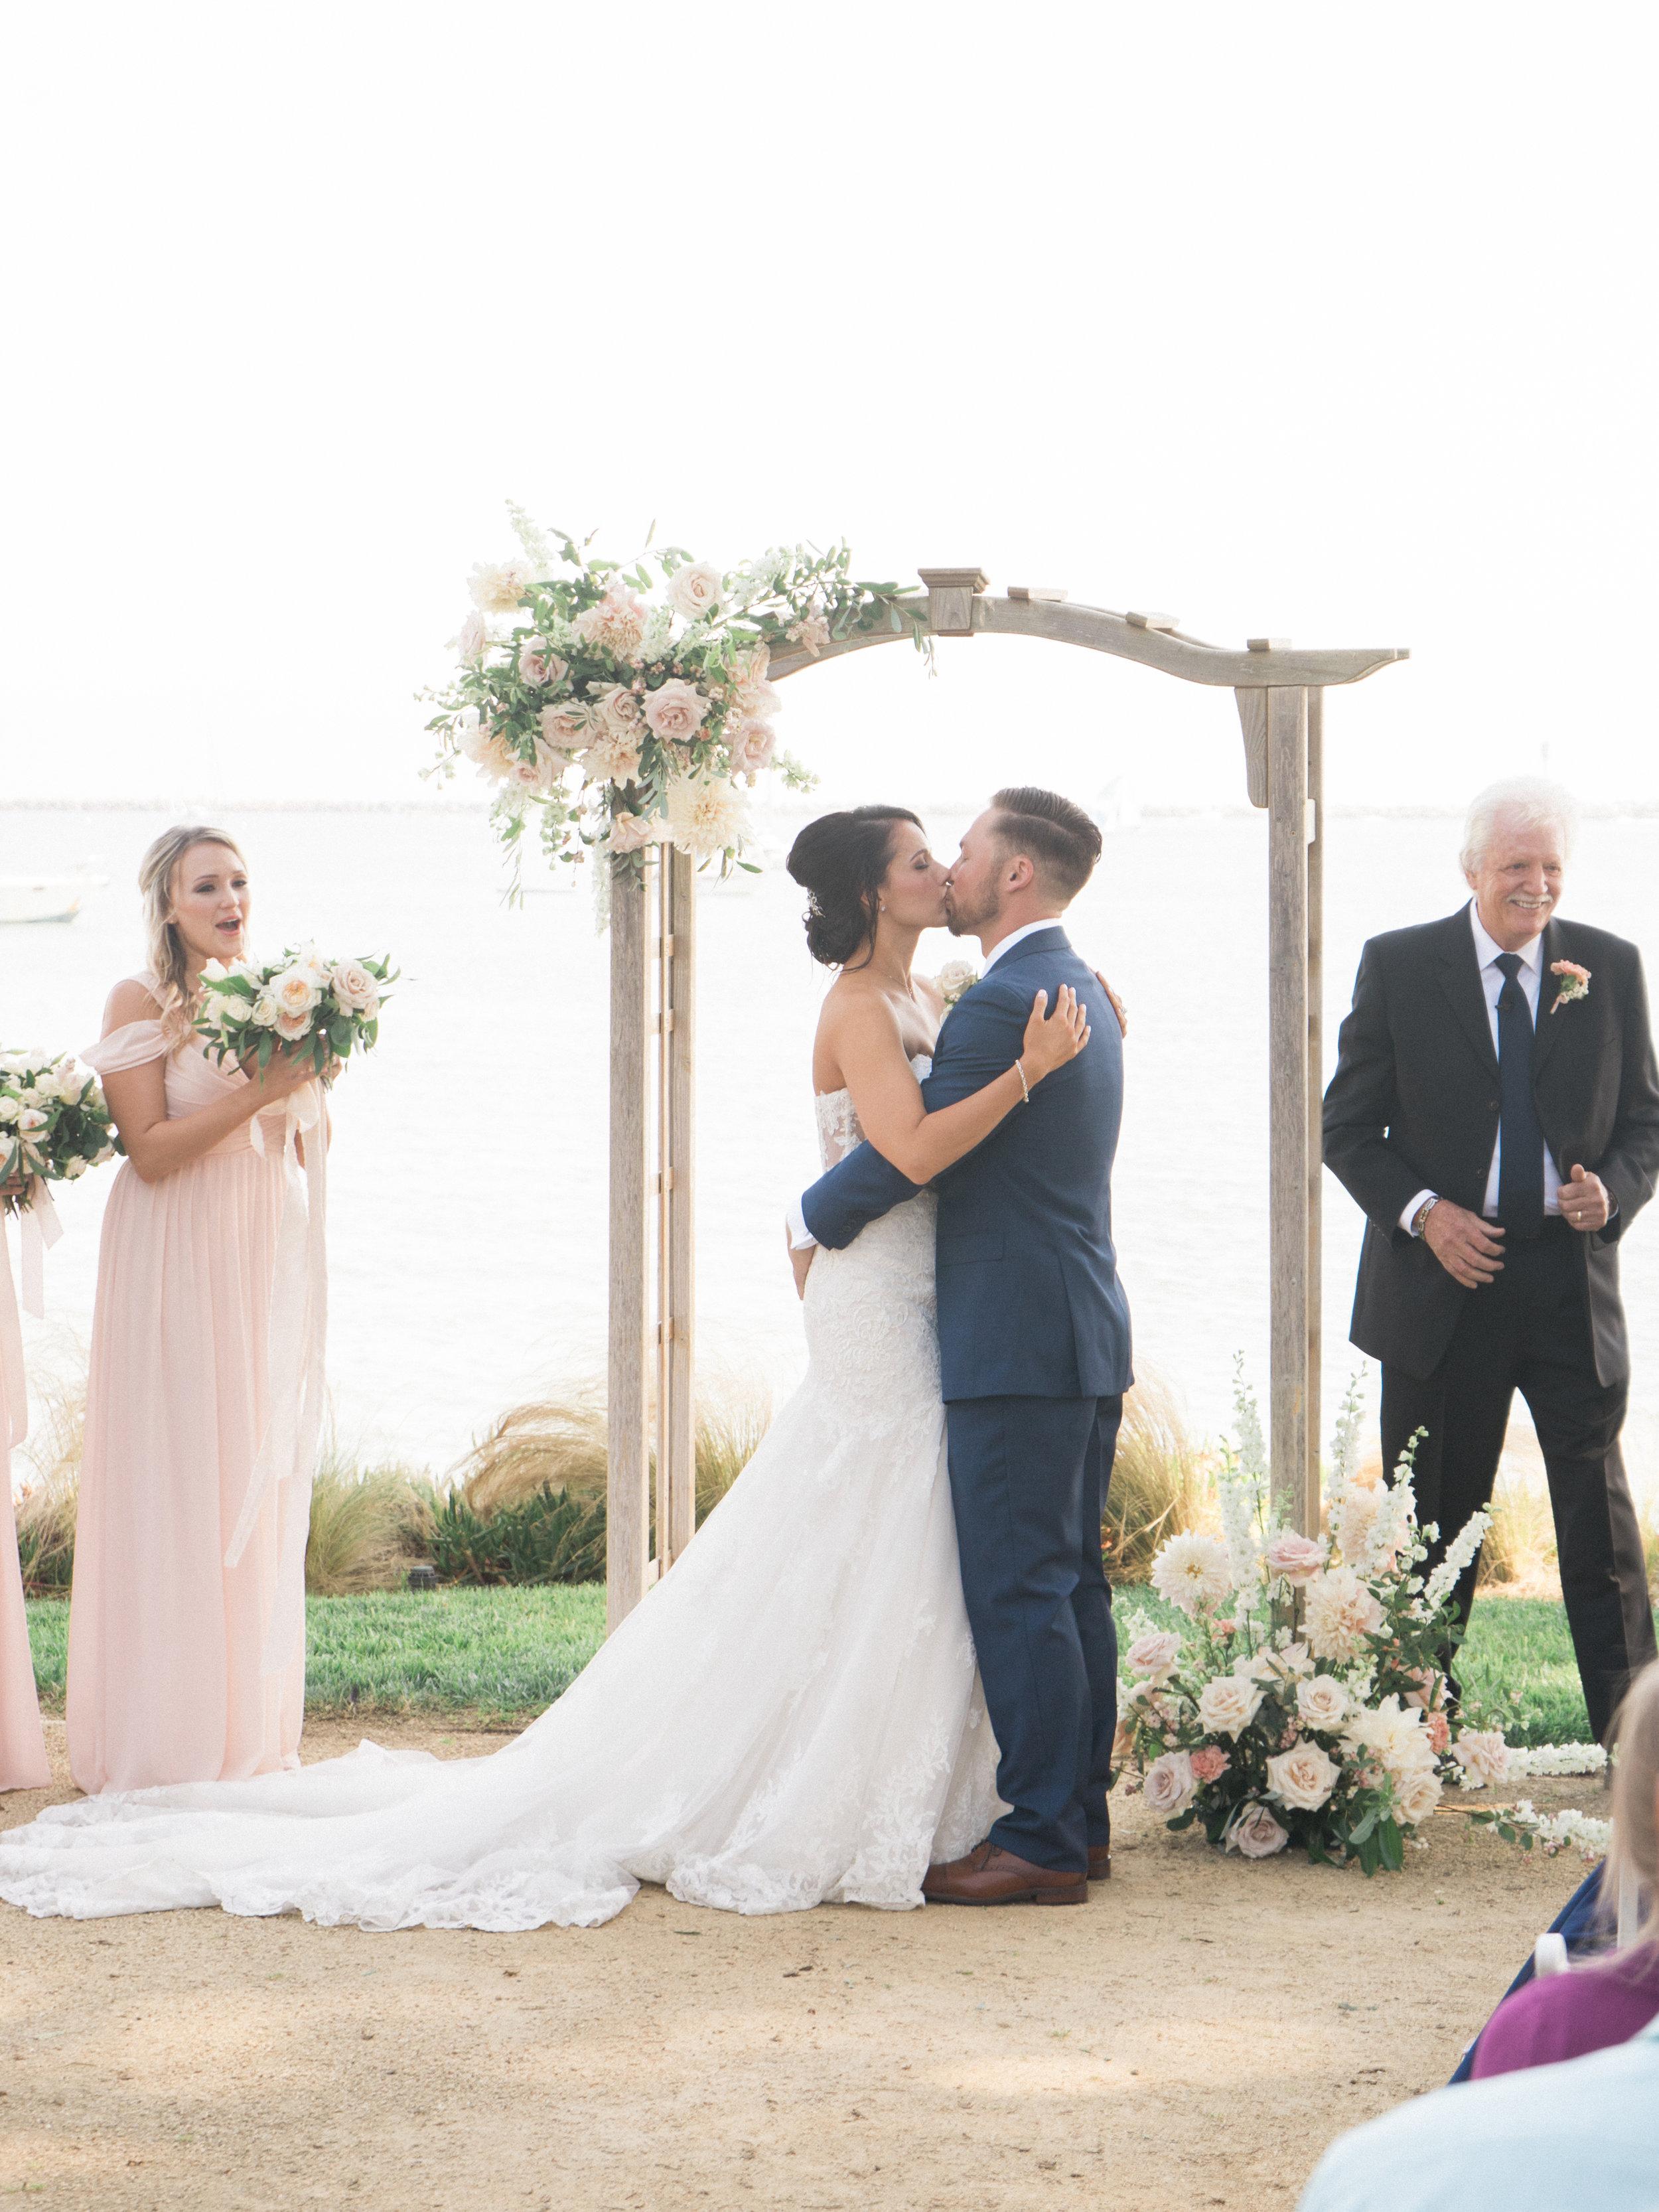 trynhphoto_socal_sf_halfmoon_bay_wedding_photographer_JA-364.jpg